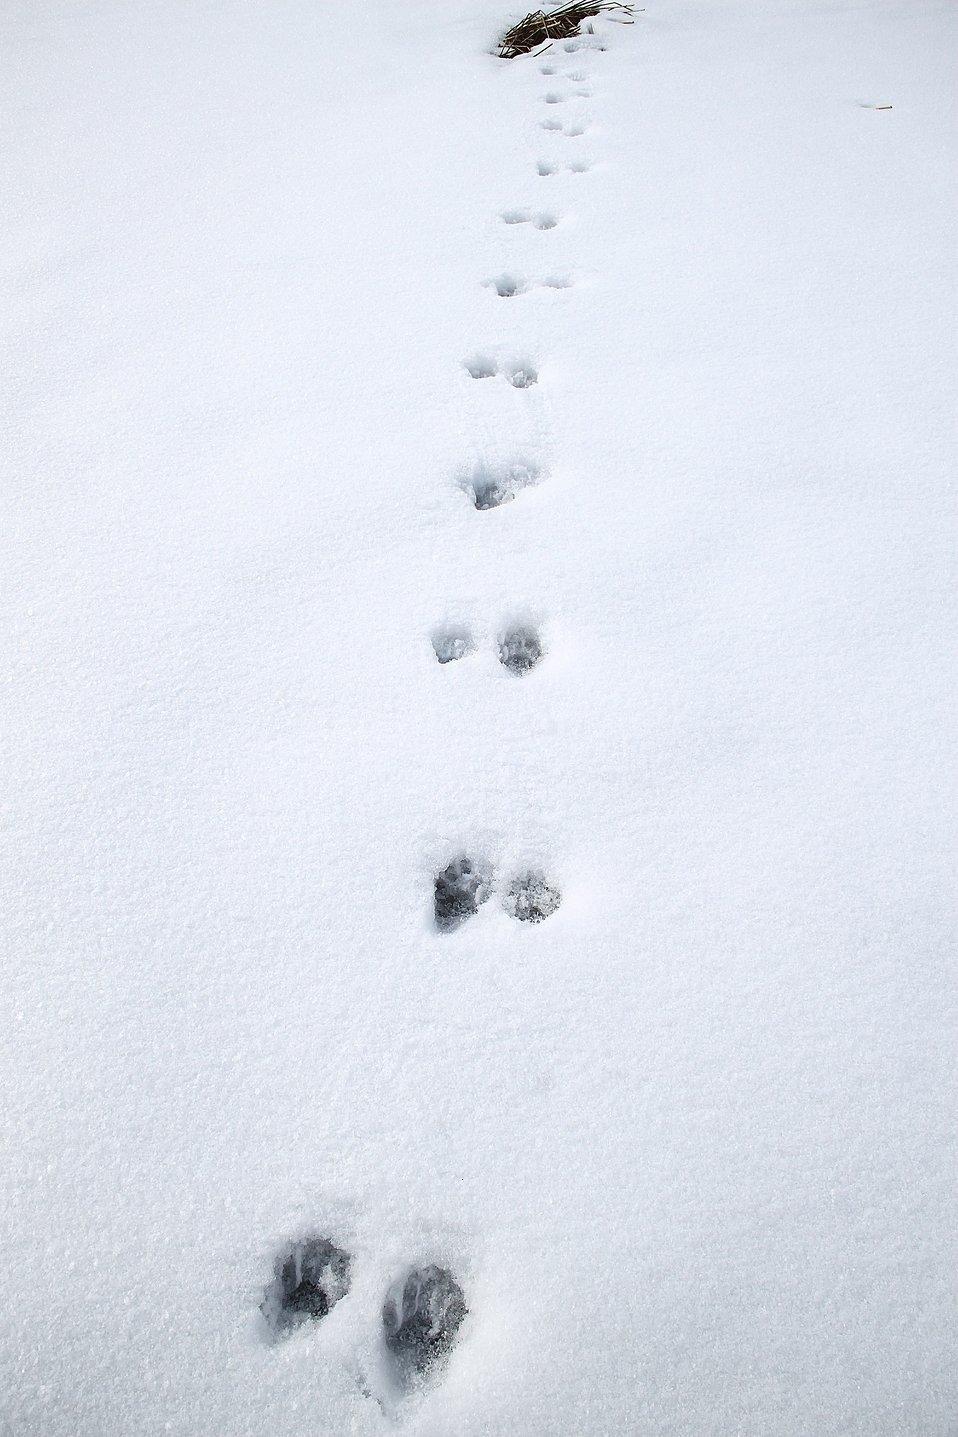 Weasel tracks